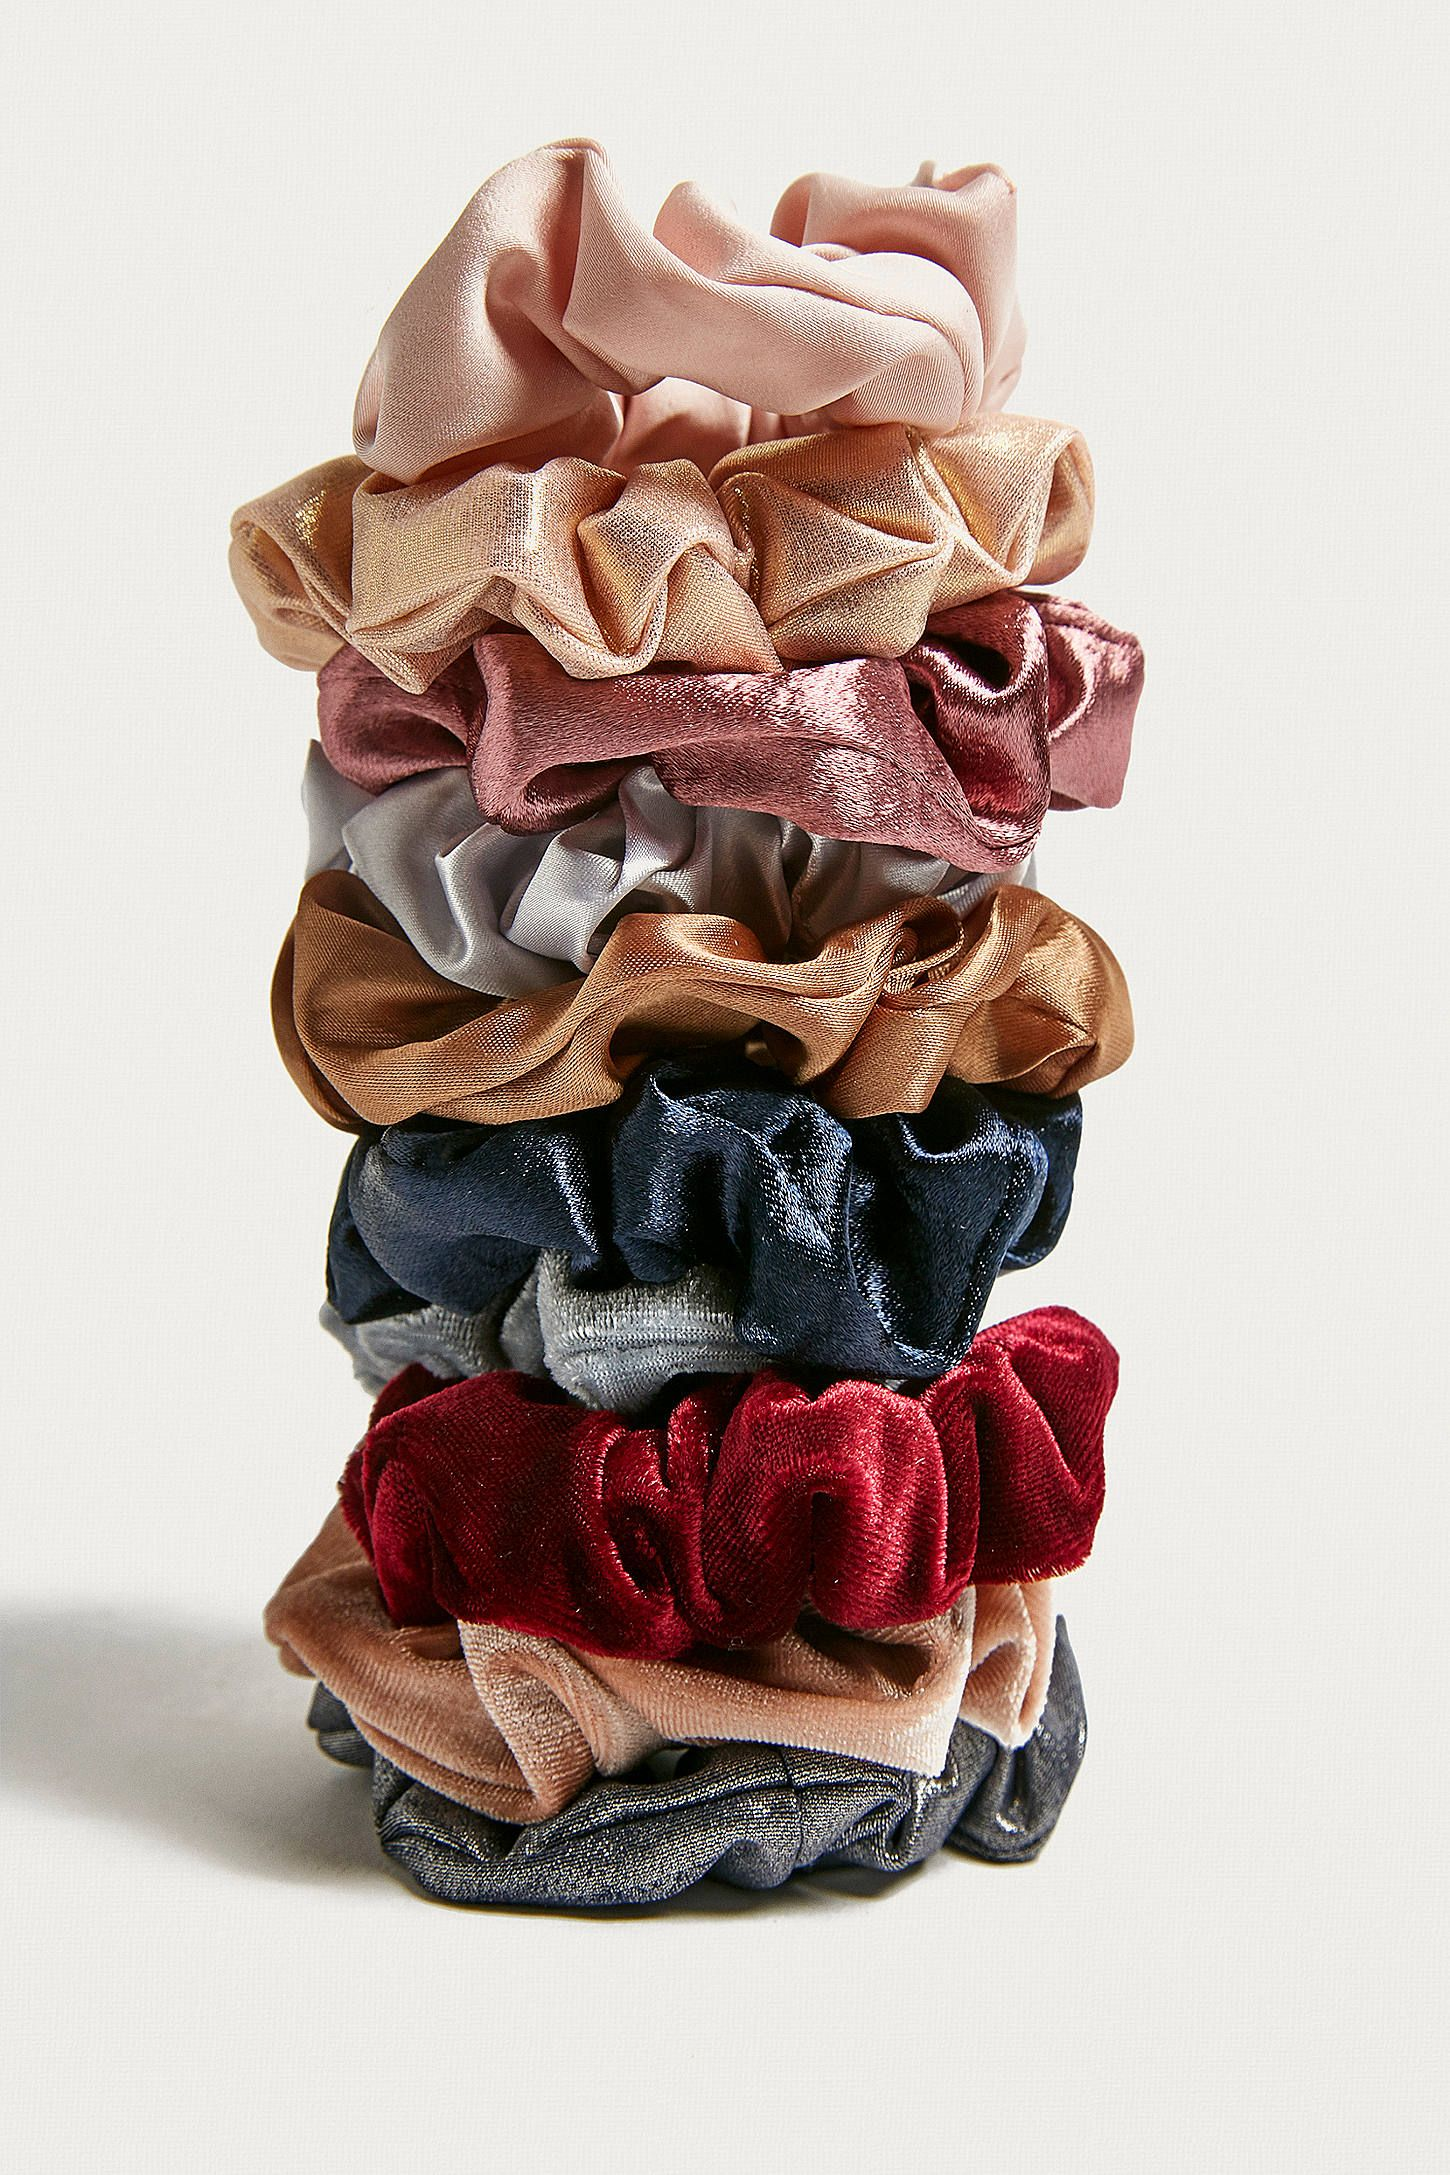 Perfect 10 Scrunchie Set in 2020 Velvet hair, Scrunchies